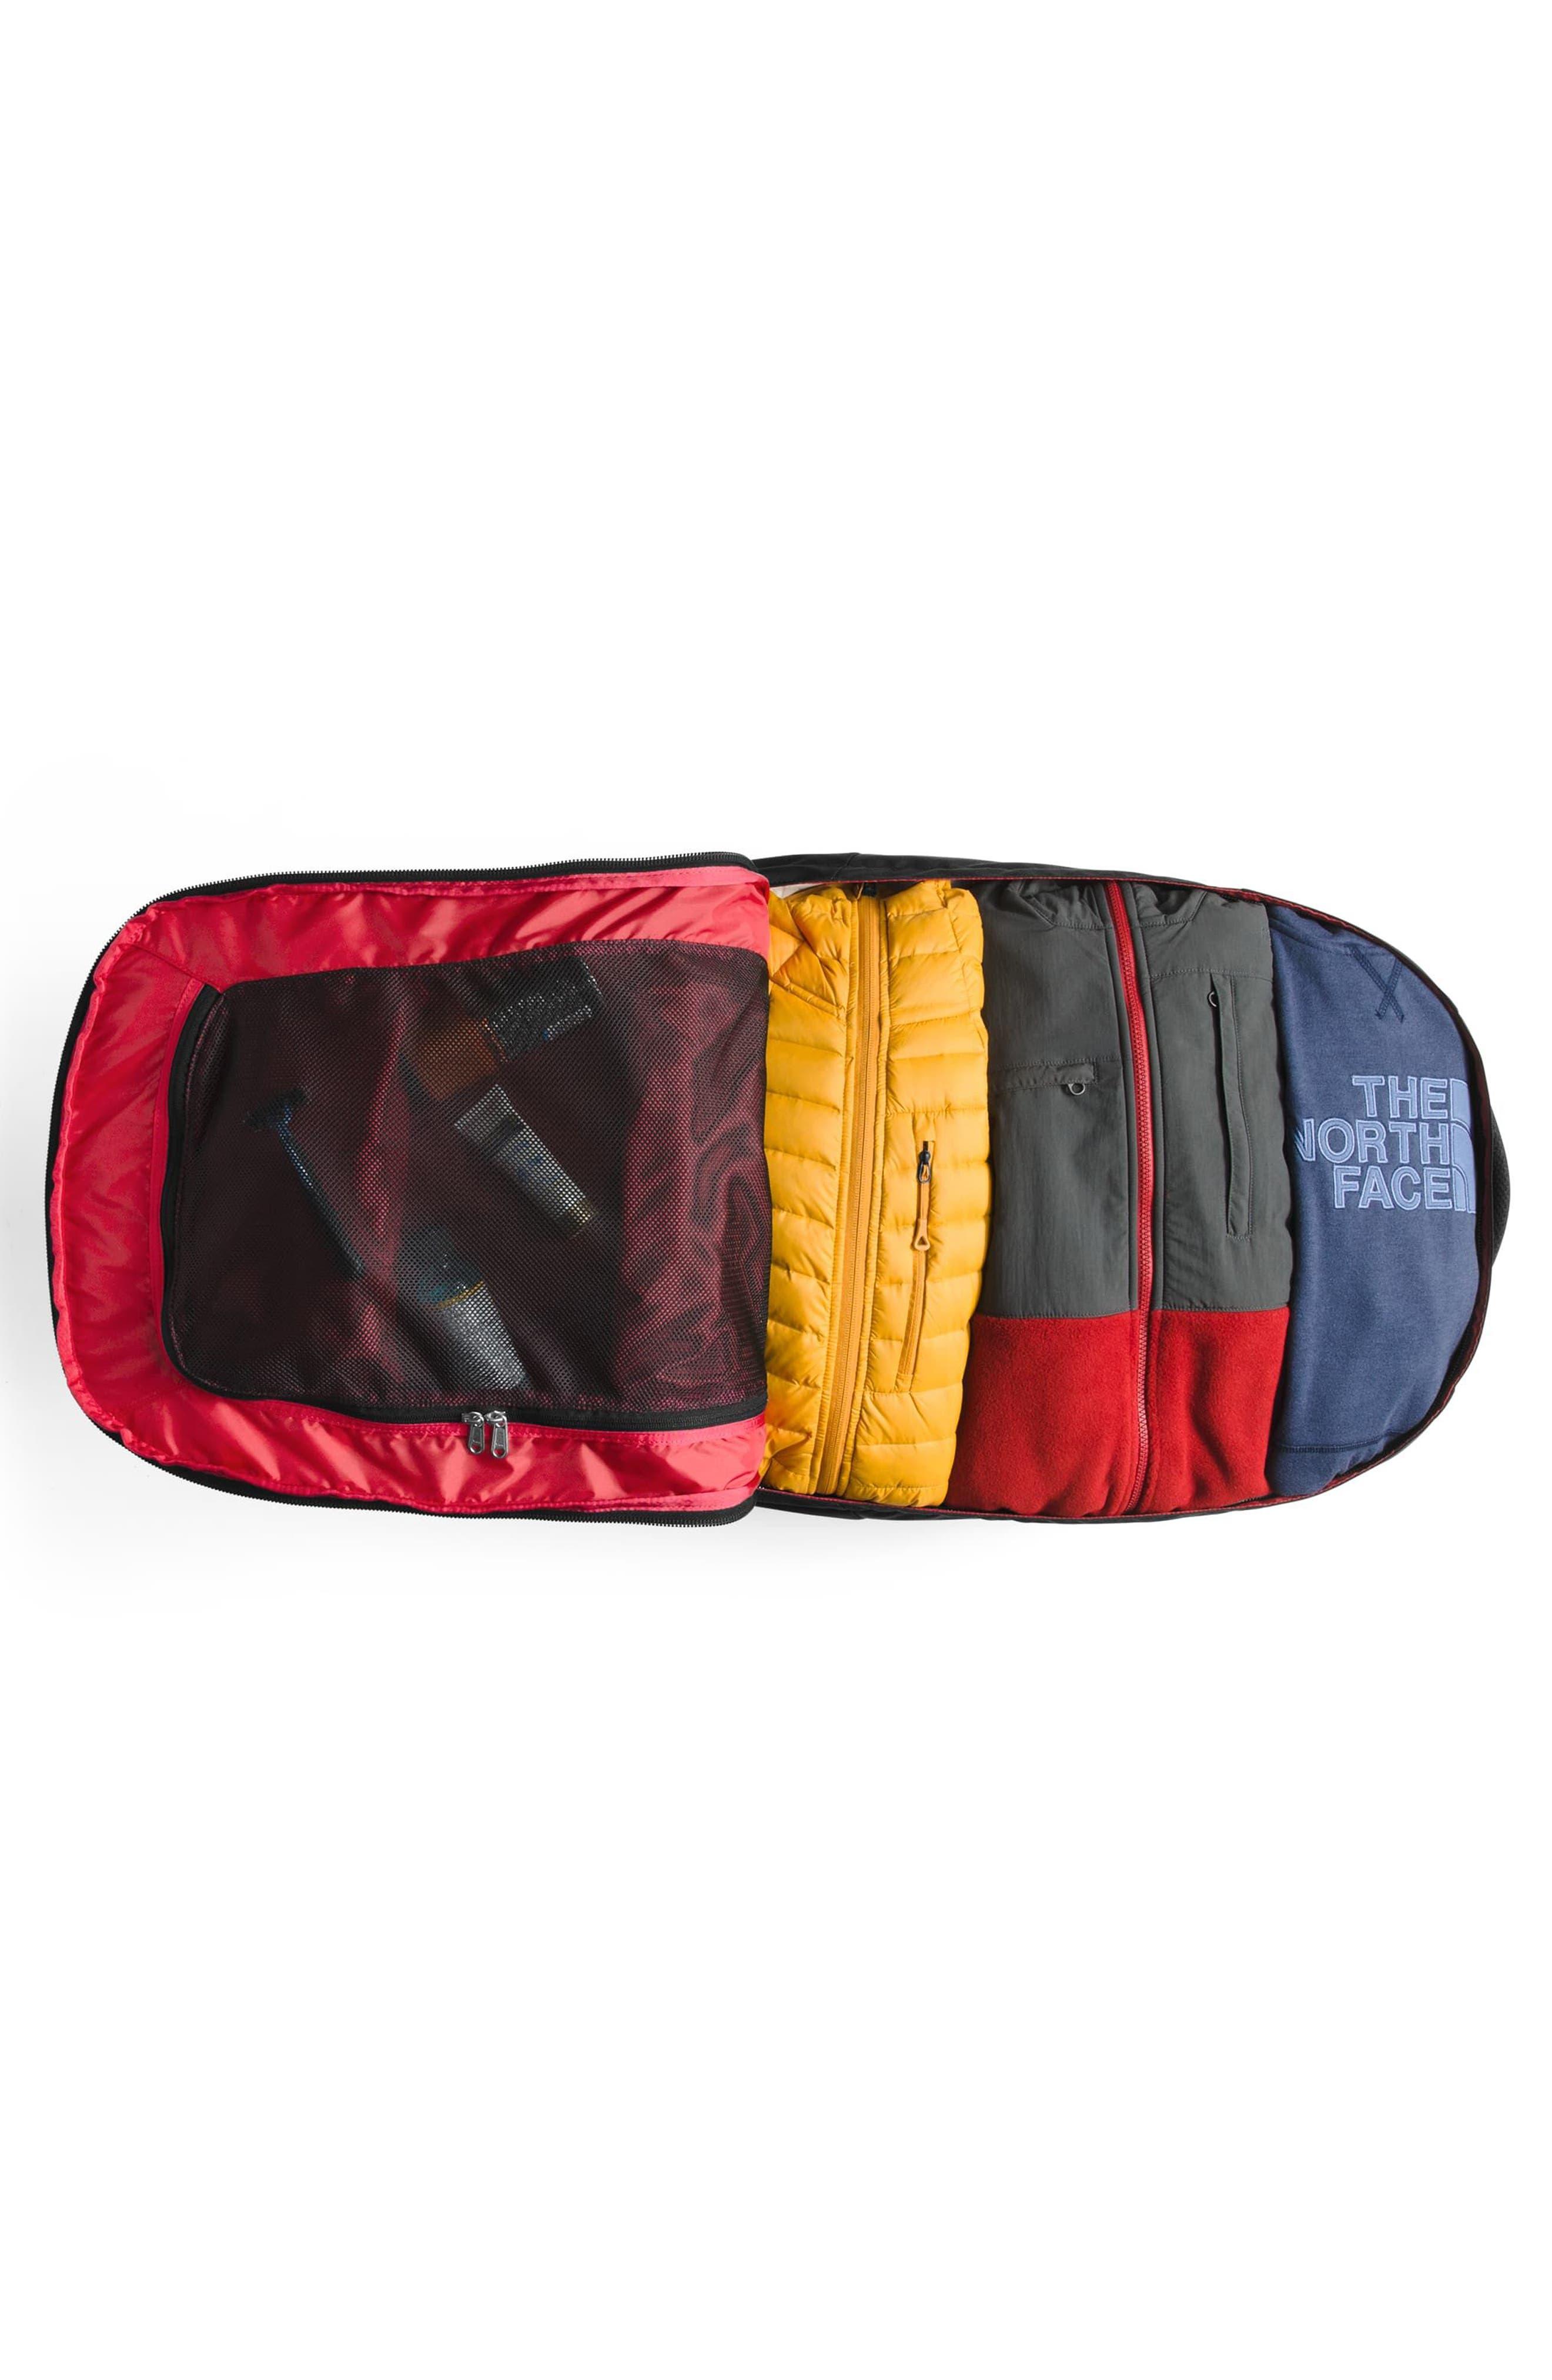 Long Haul 26-Inch Rolling Duffel Bag,                             Alternate thumbnail 3, color,                             001